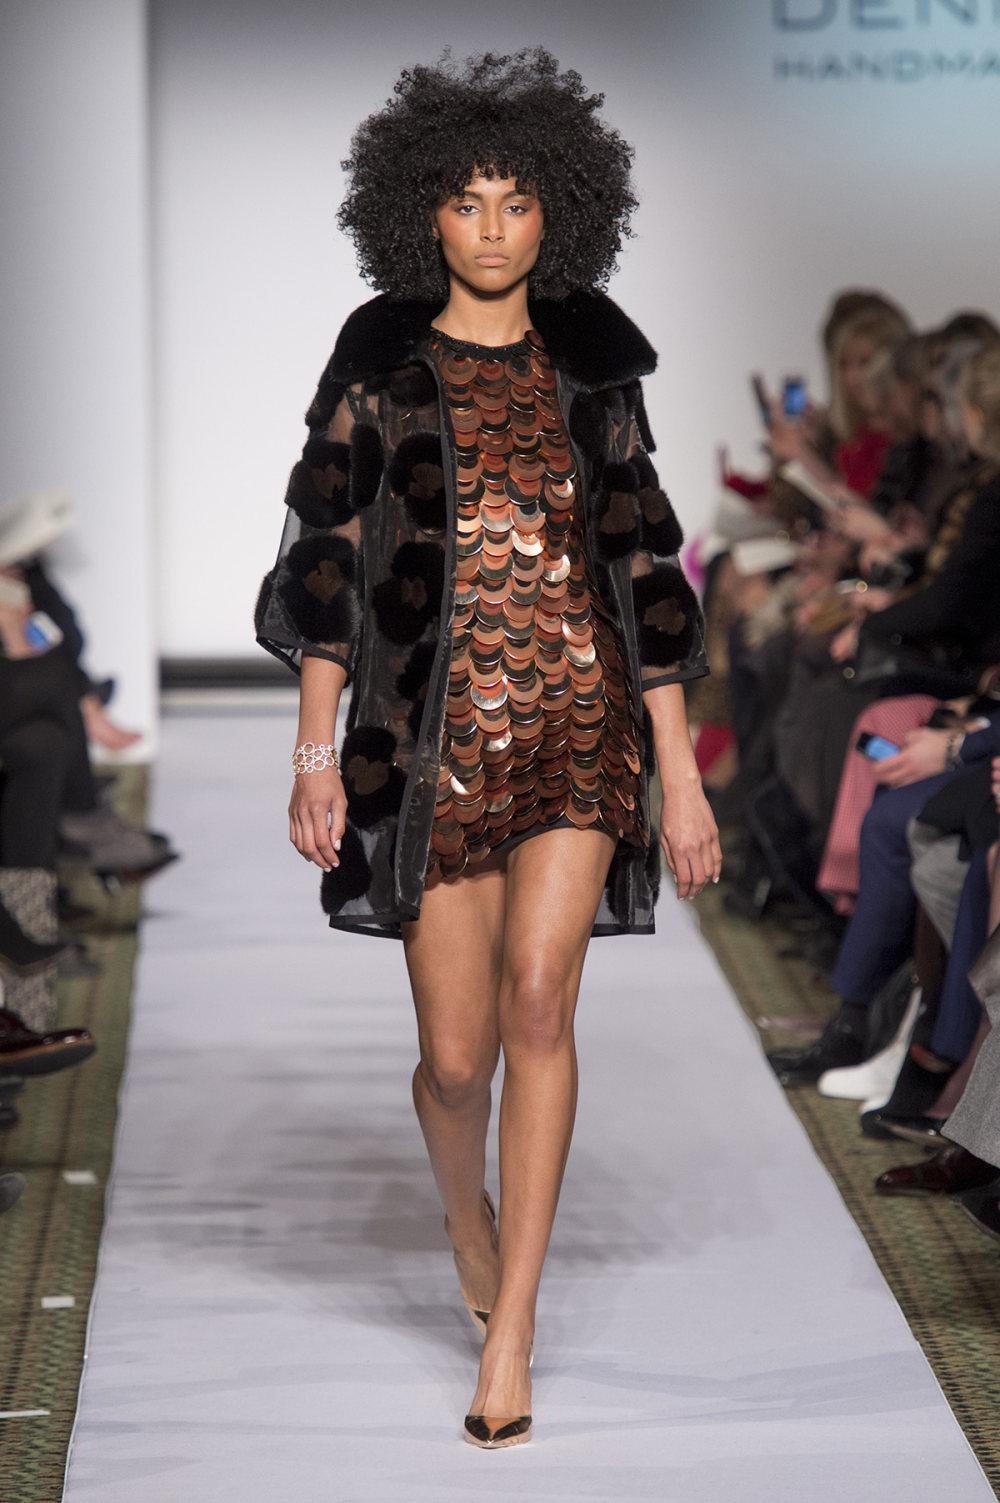 Carolina Herrera时装系列用鲜艳的颜色充满智能的黑白色调-48.jpg